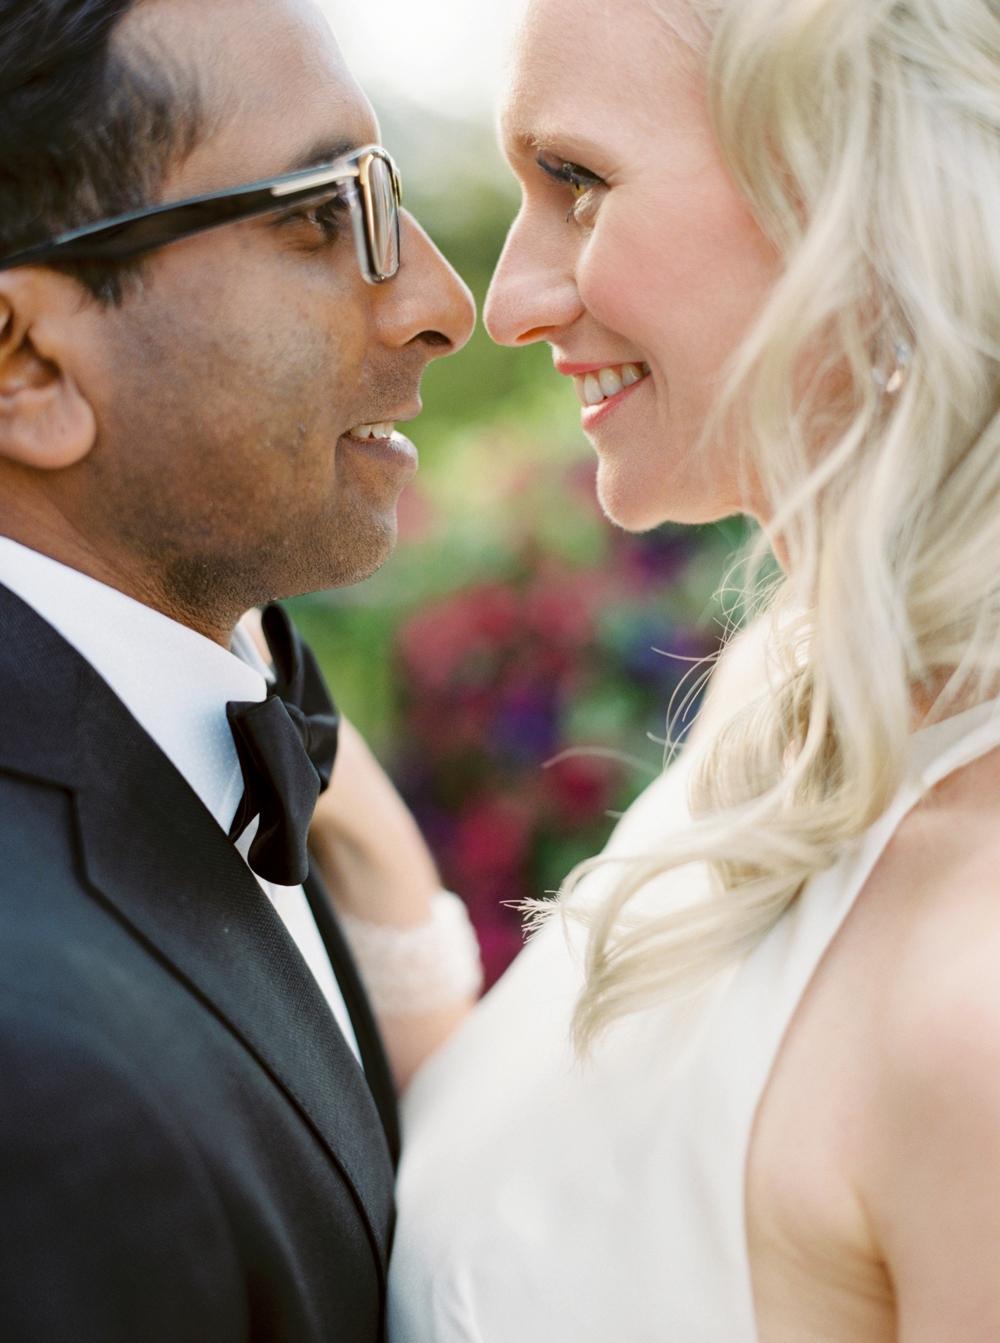 Banff Wedding Photographers | Fairmont Banff Springs Hotel Wedding | Banff Photography